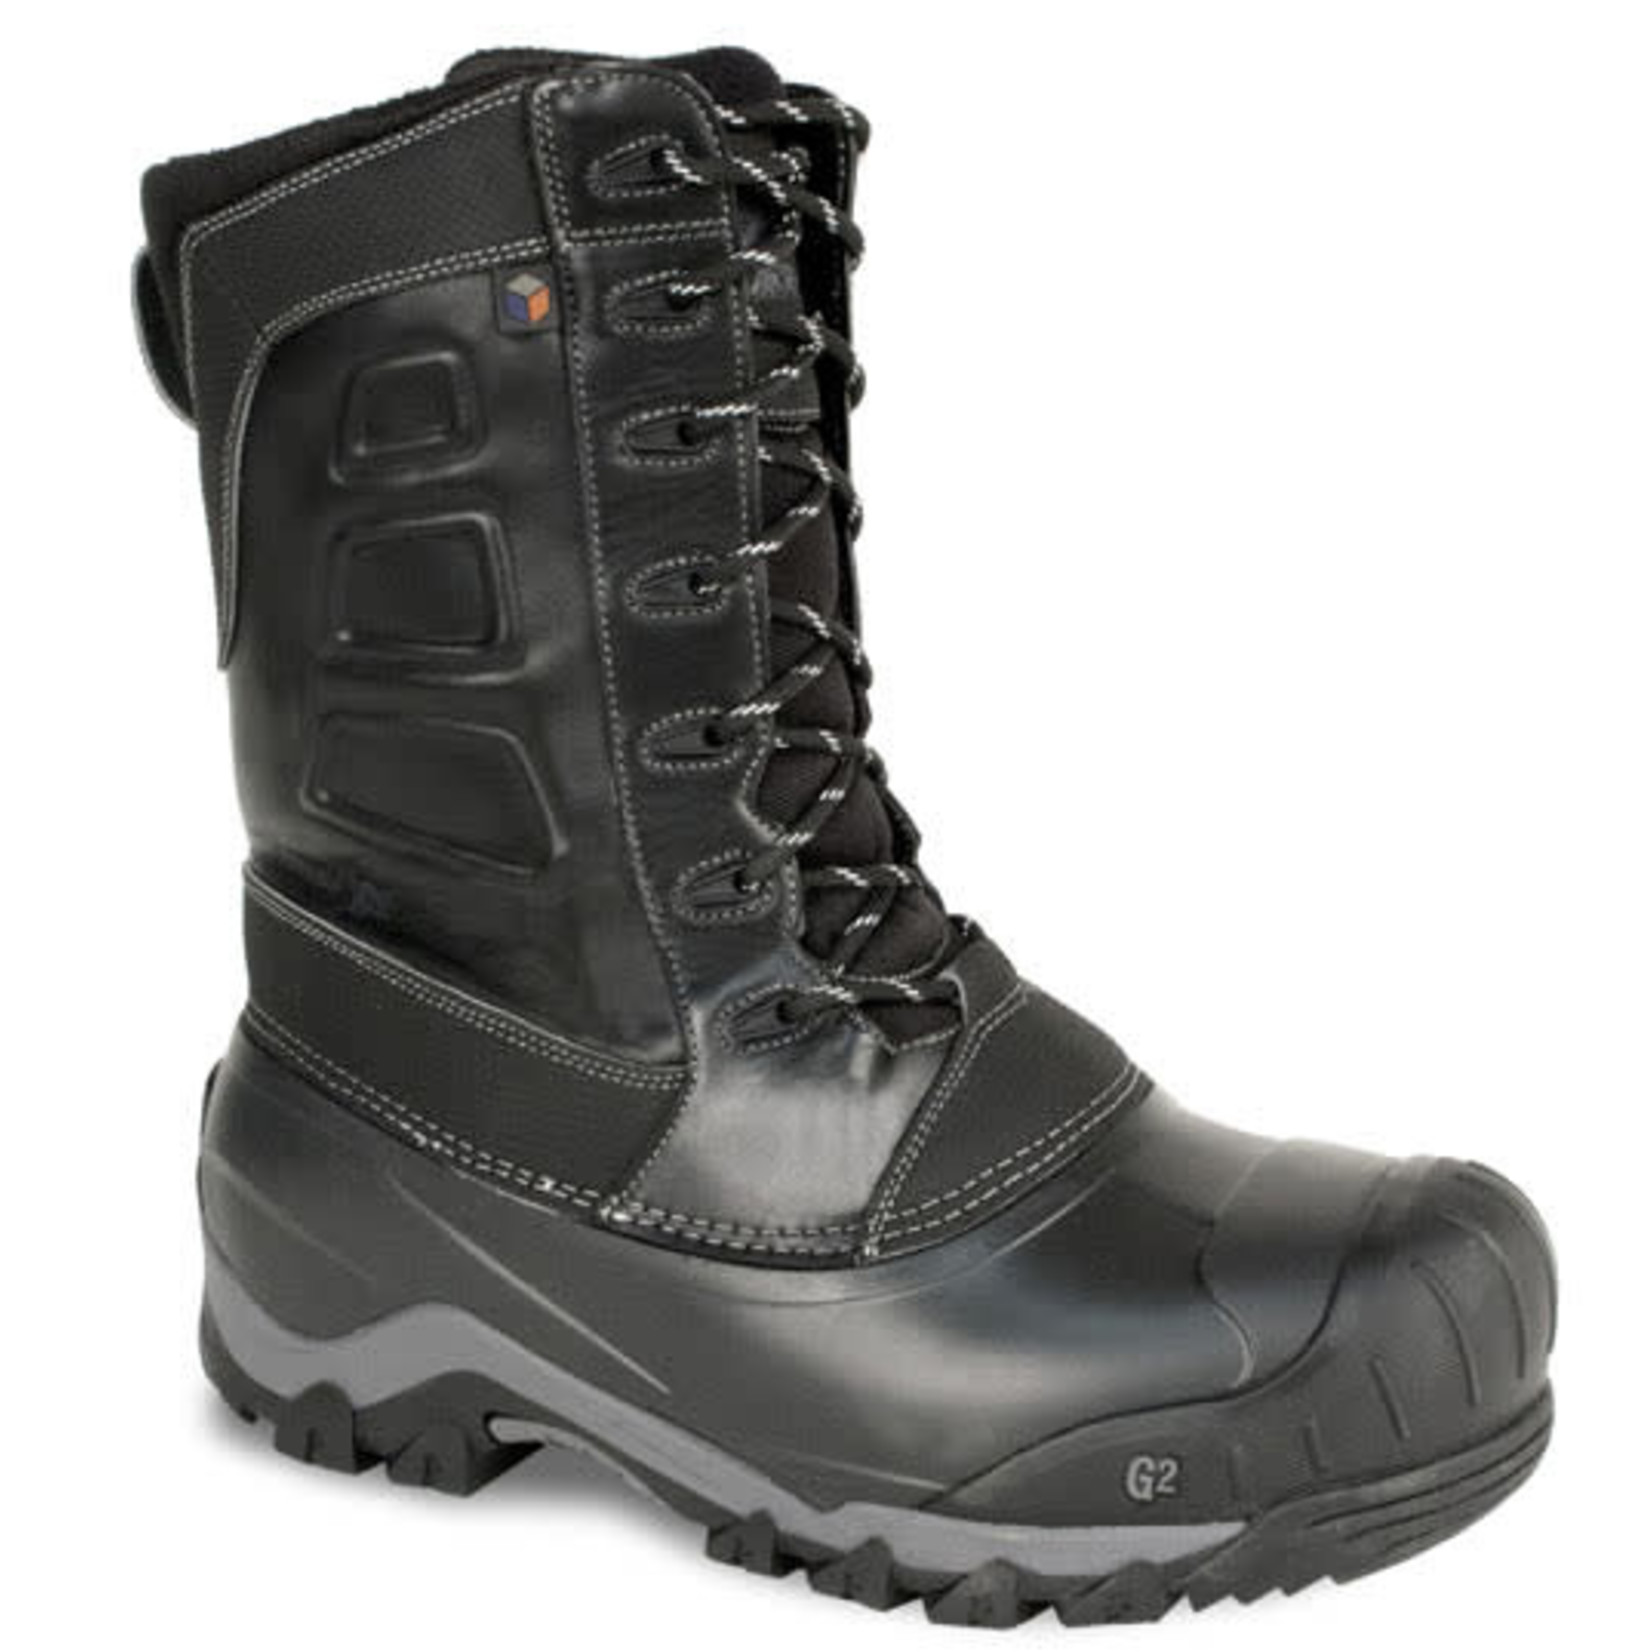 Acton Men's Acton Fairbanks Winter Boot A5728